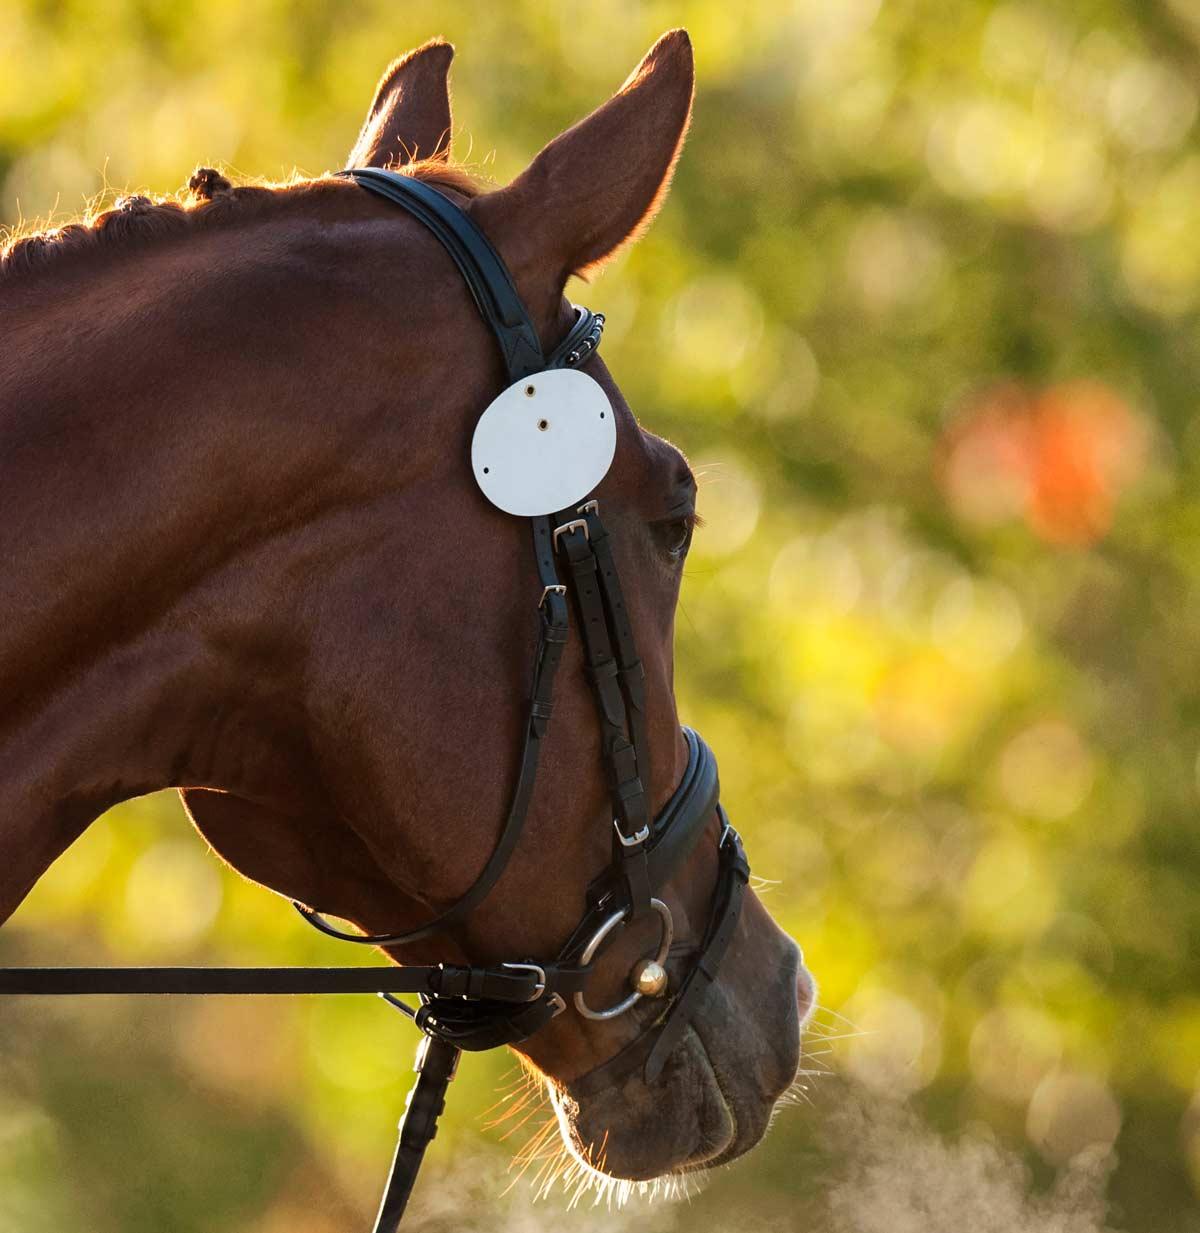 Photo of horse's head representative of equine asthma.